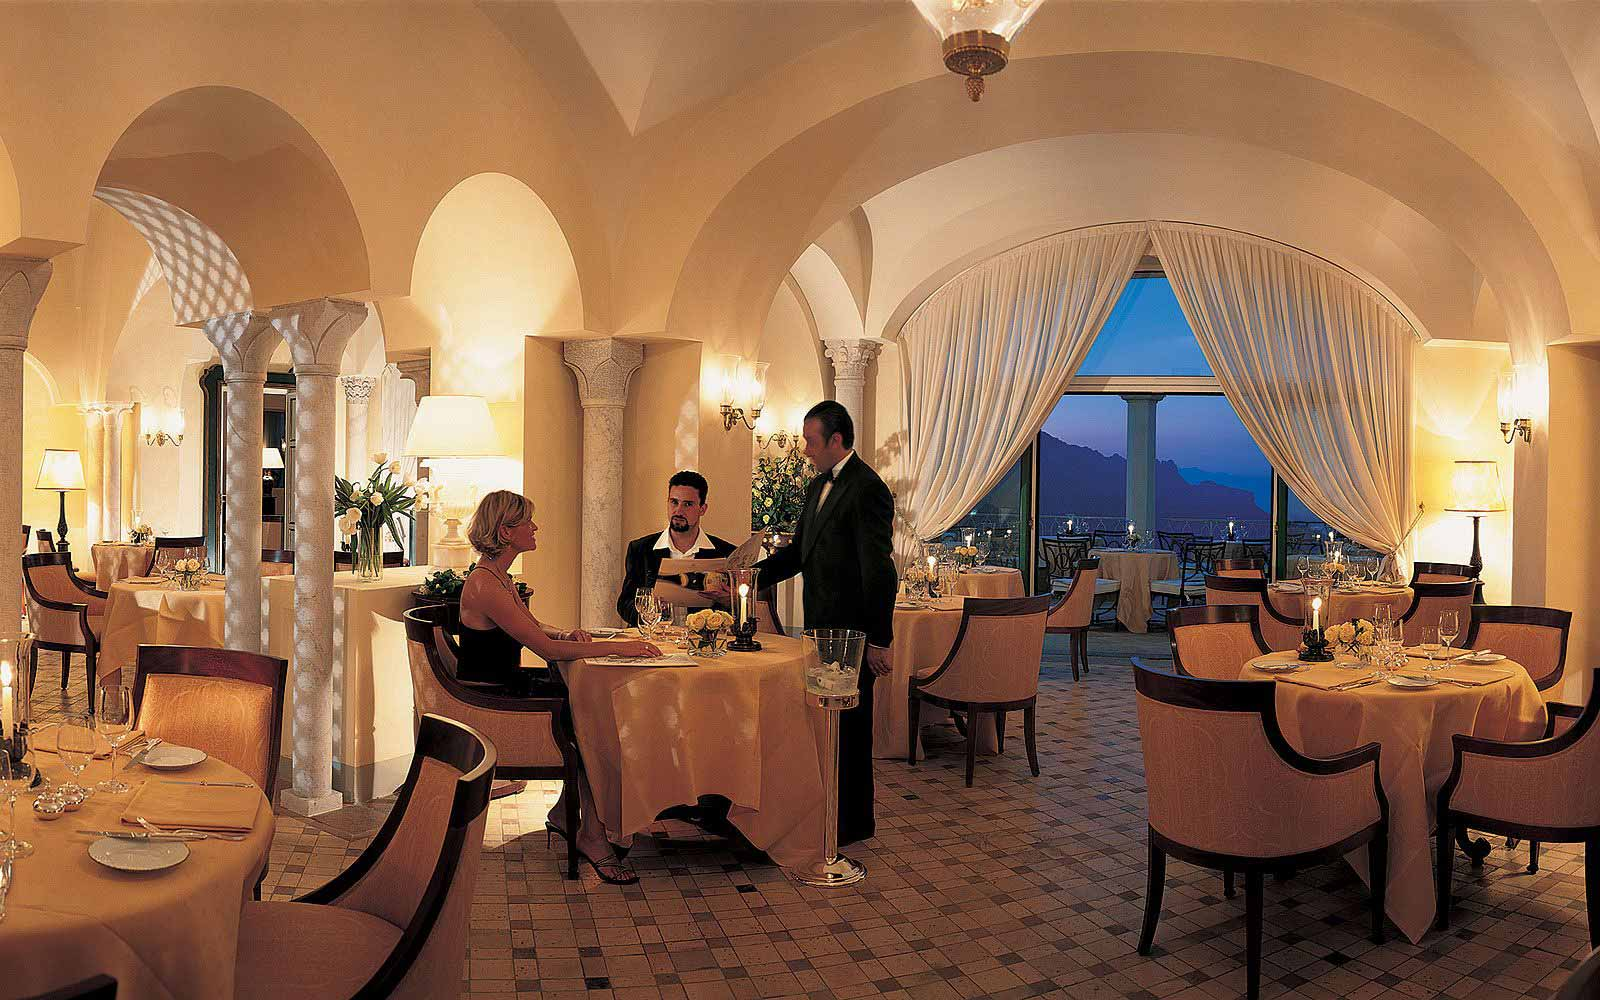 Restaurant at the Belmond Hotel Caruso